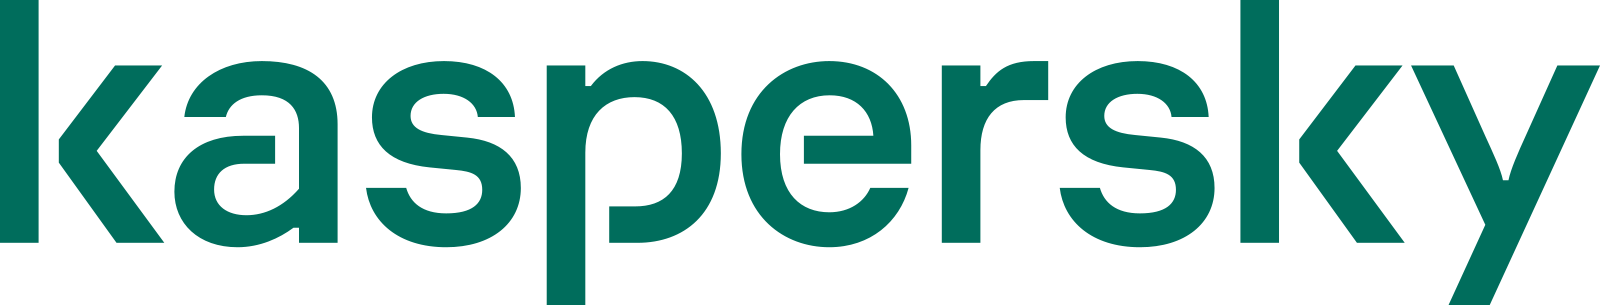 kaspersky-logo-2